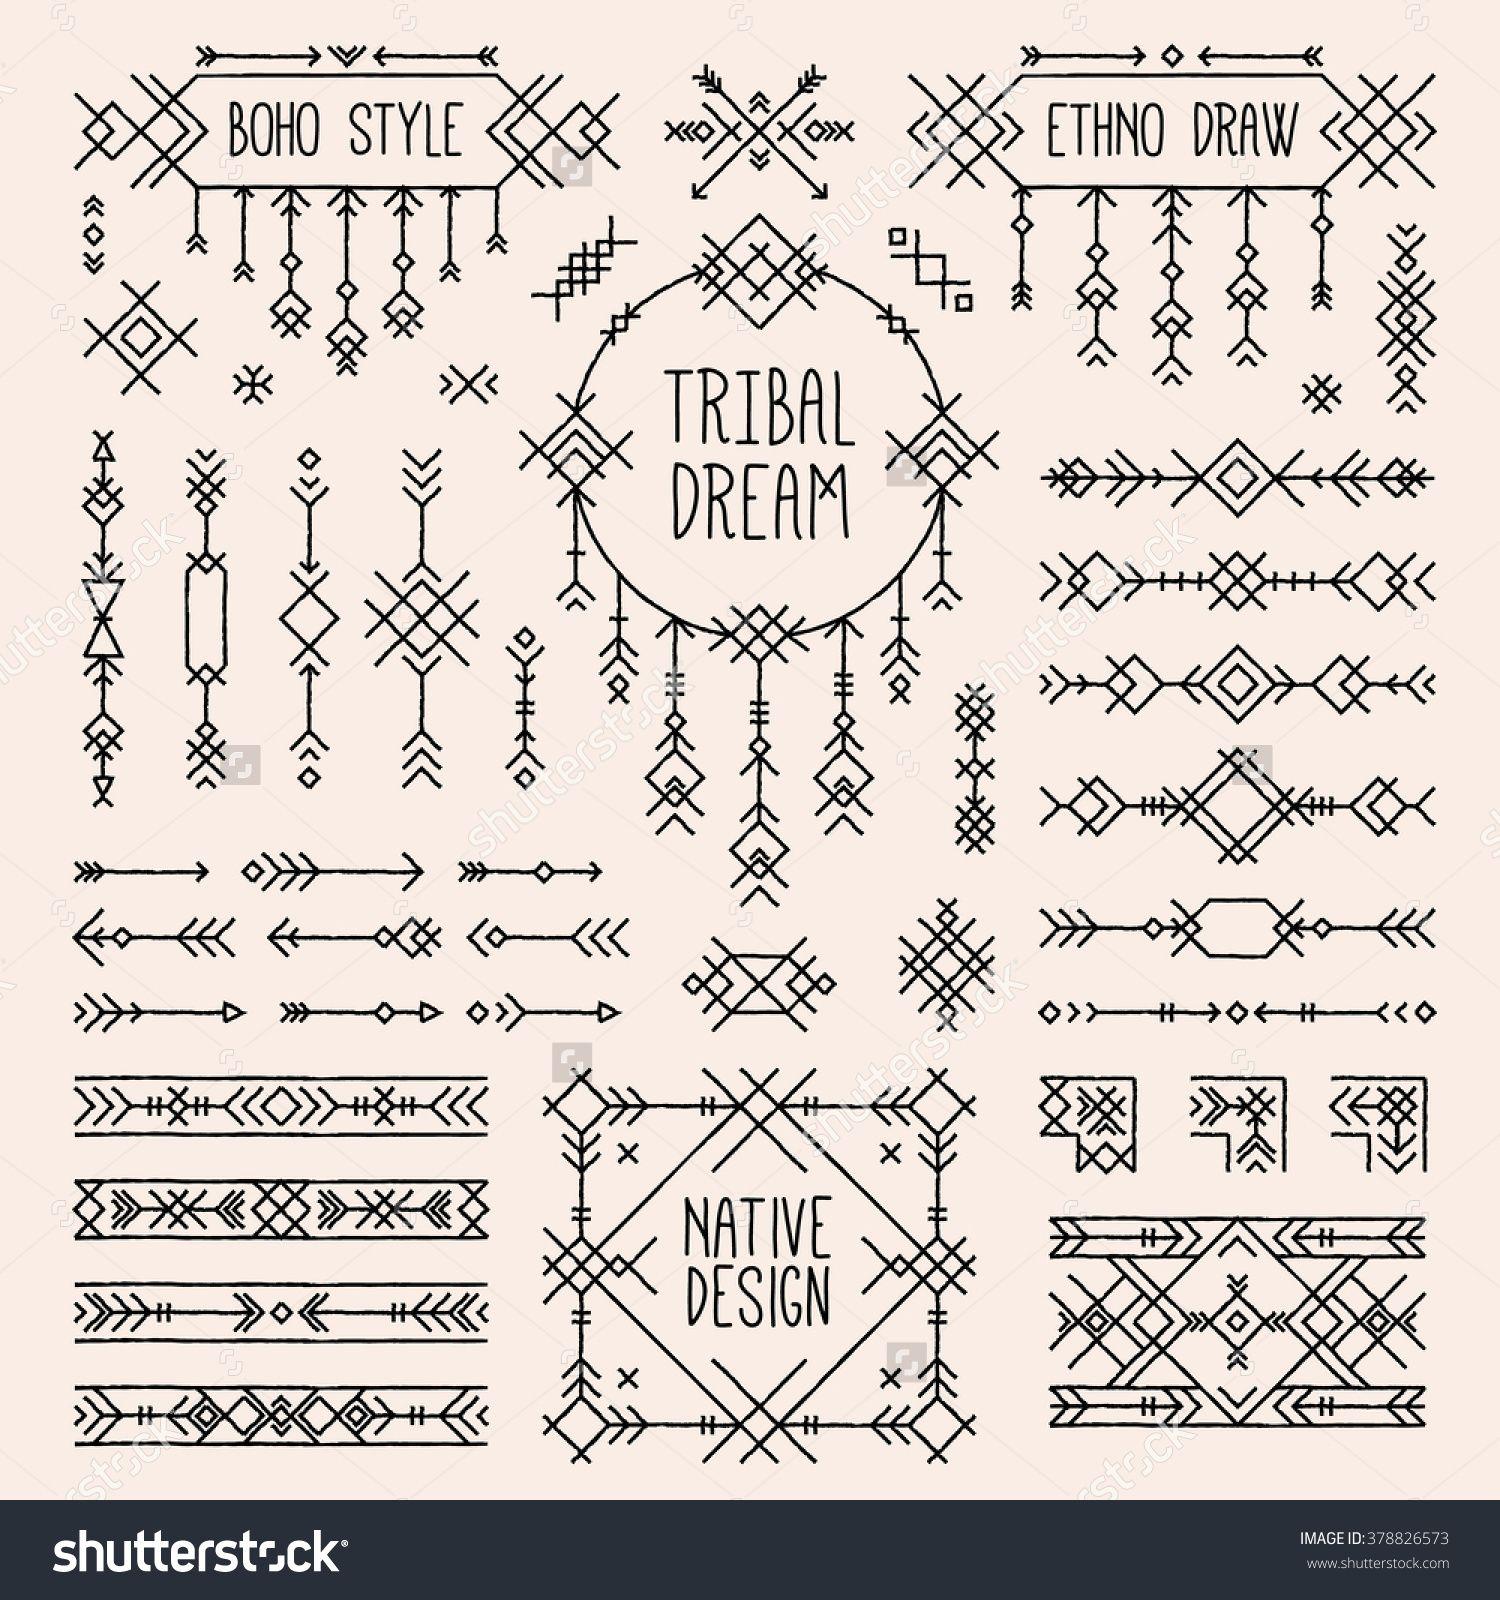 Cherokee symbols and meanings topic cherokee symbols and cherokee symbols and meanings topic cherokee symbols and meanings my cherokee heritage pinterest cherokee symbols cherokee and symbols buycottarizona